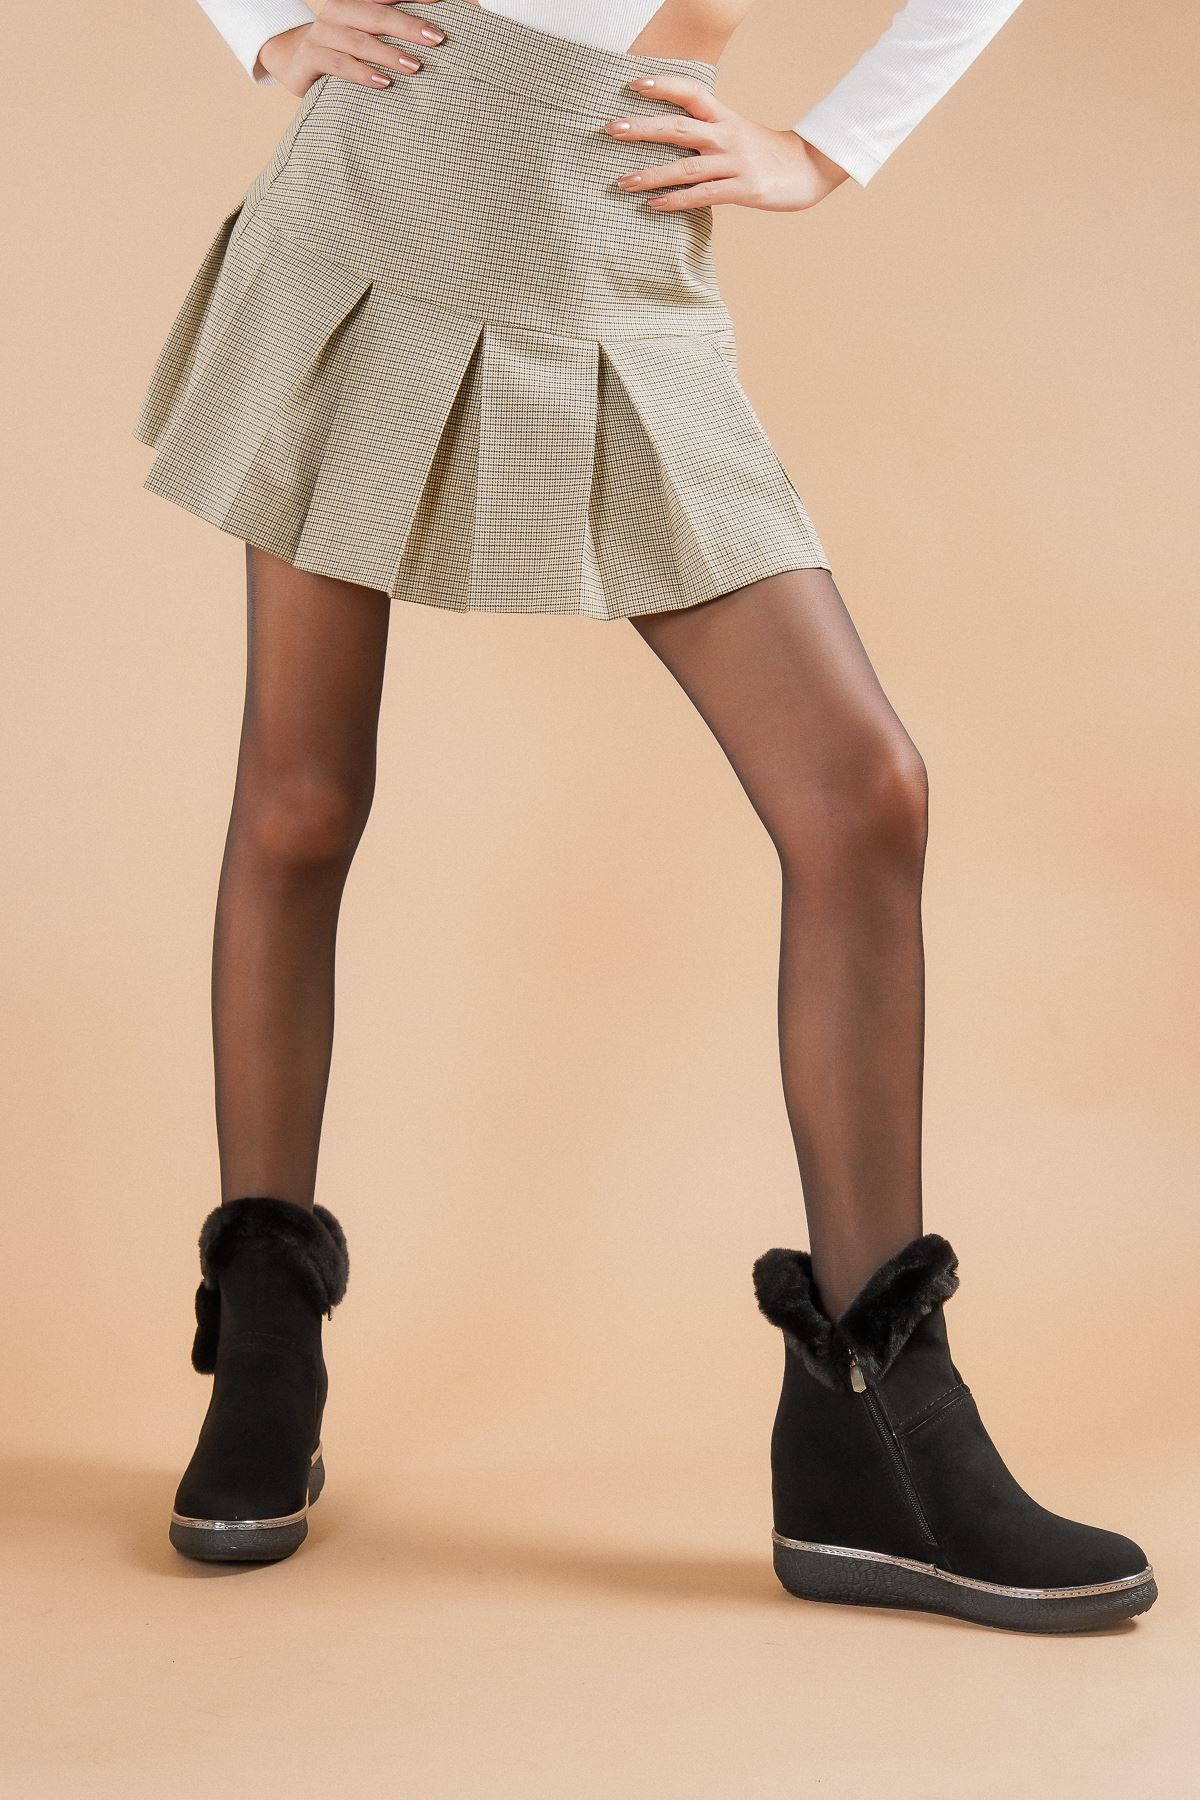 Frida Siyah Süet Topuklu Kadın Bot